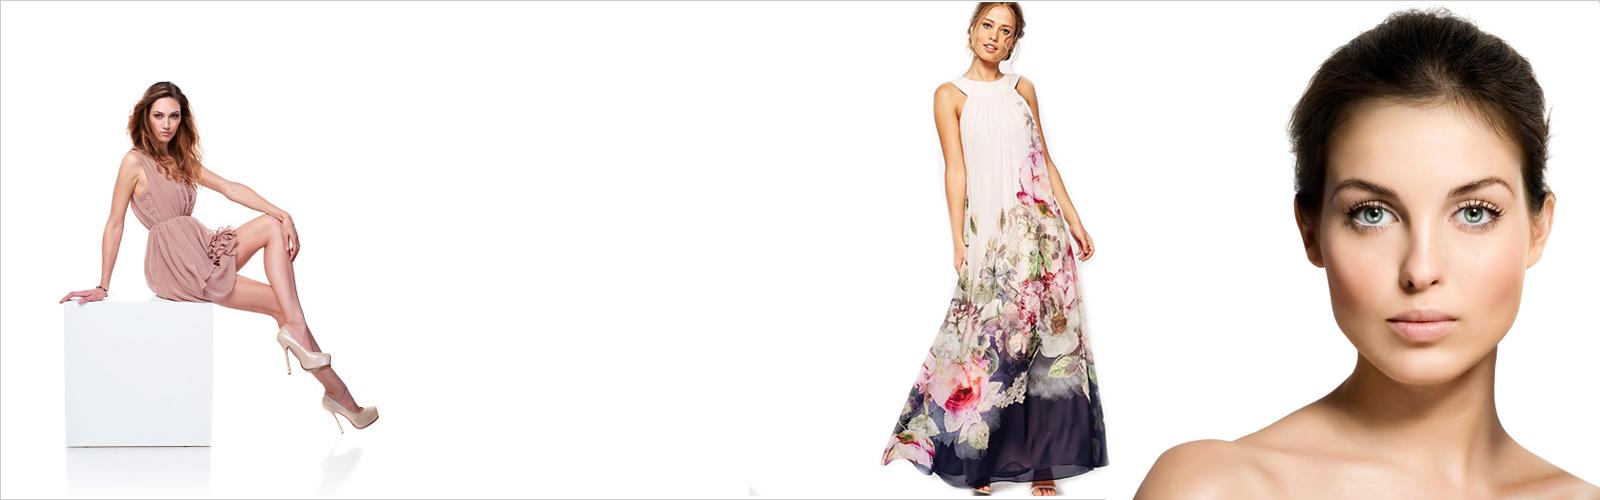 fashion retouching services